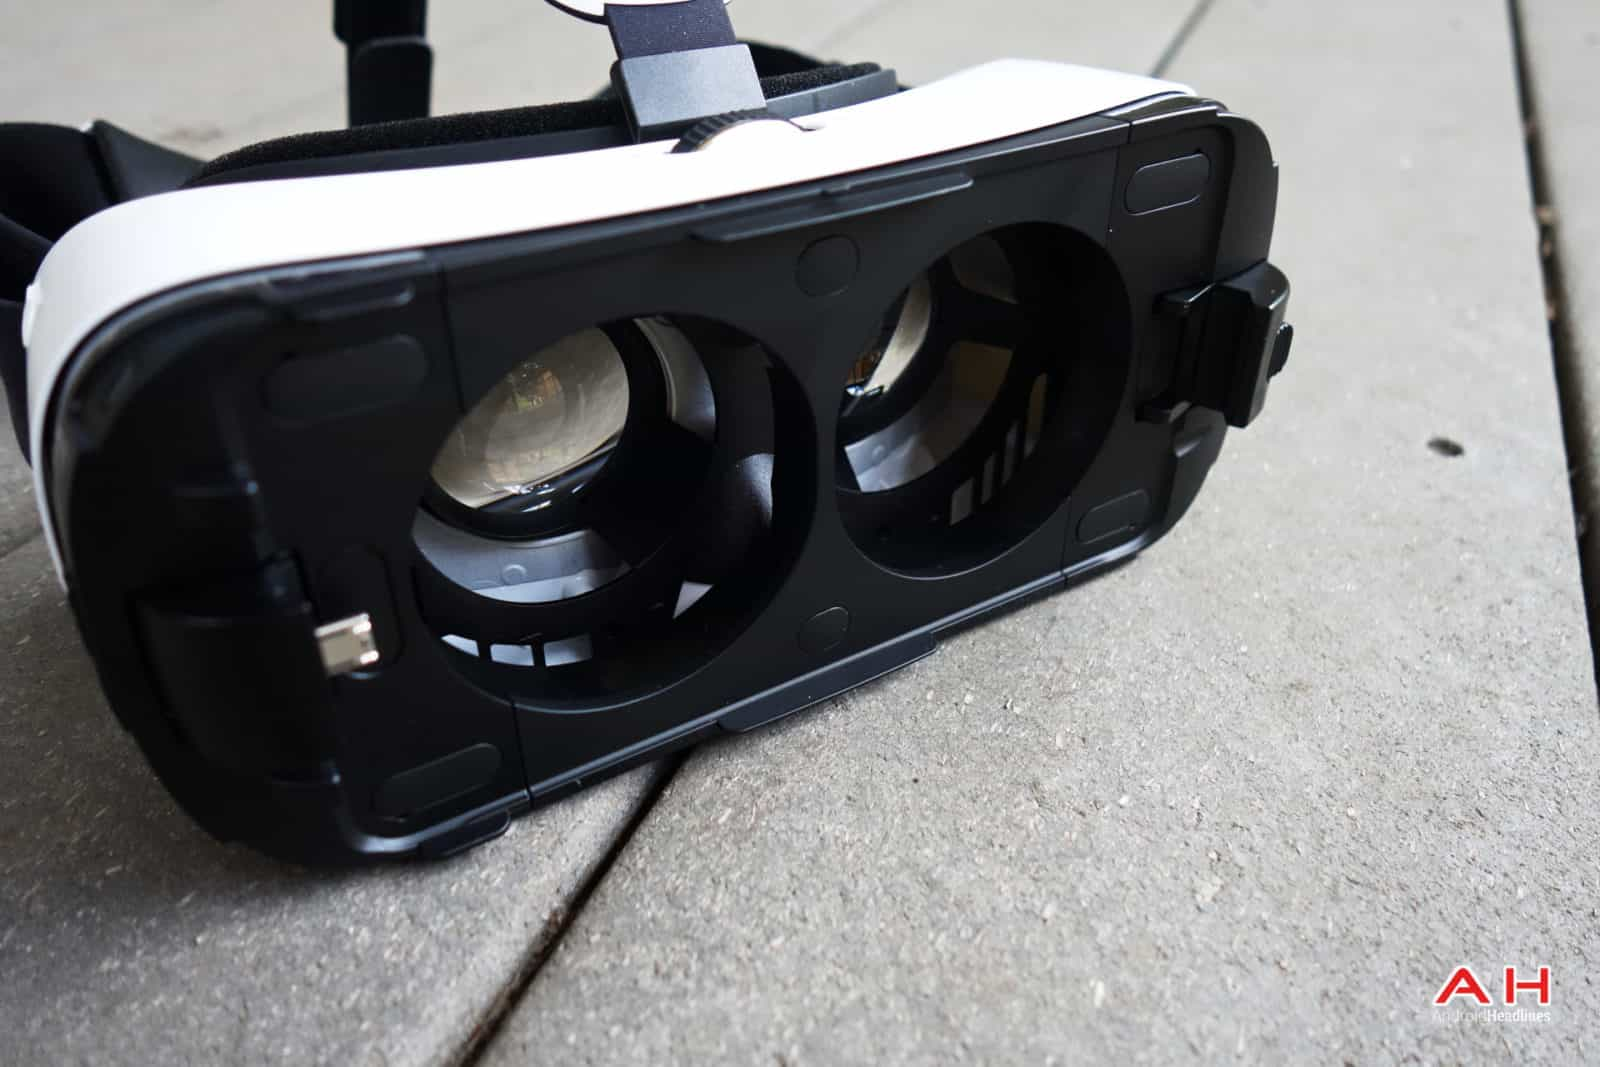 AH Samsung Gear VR-14